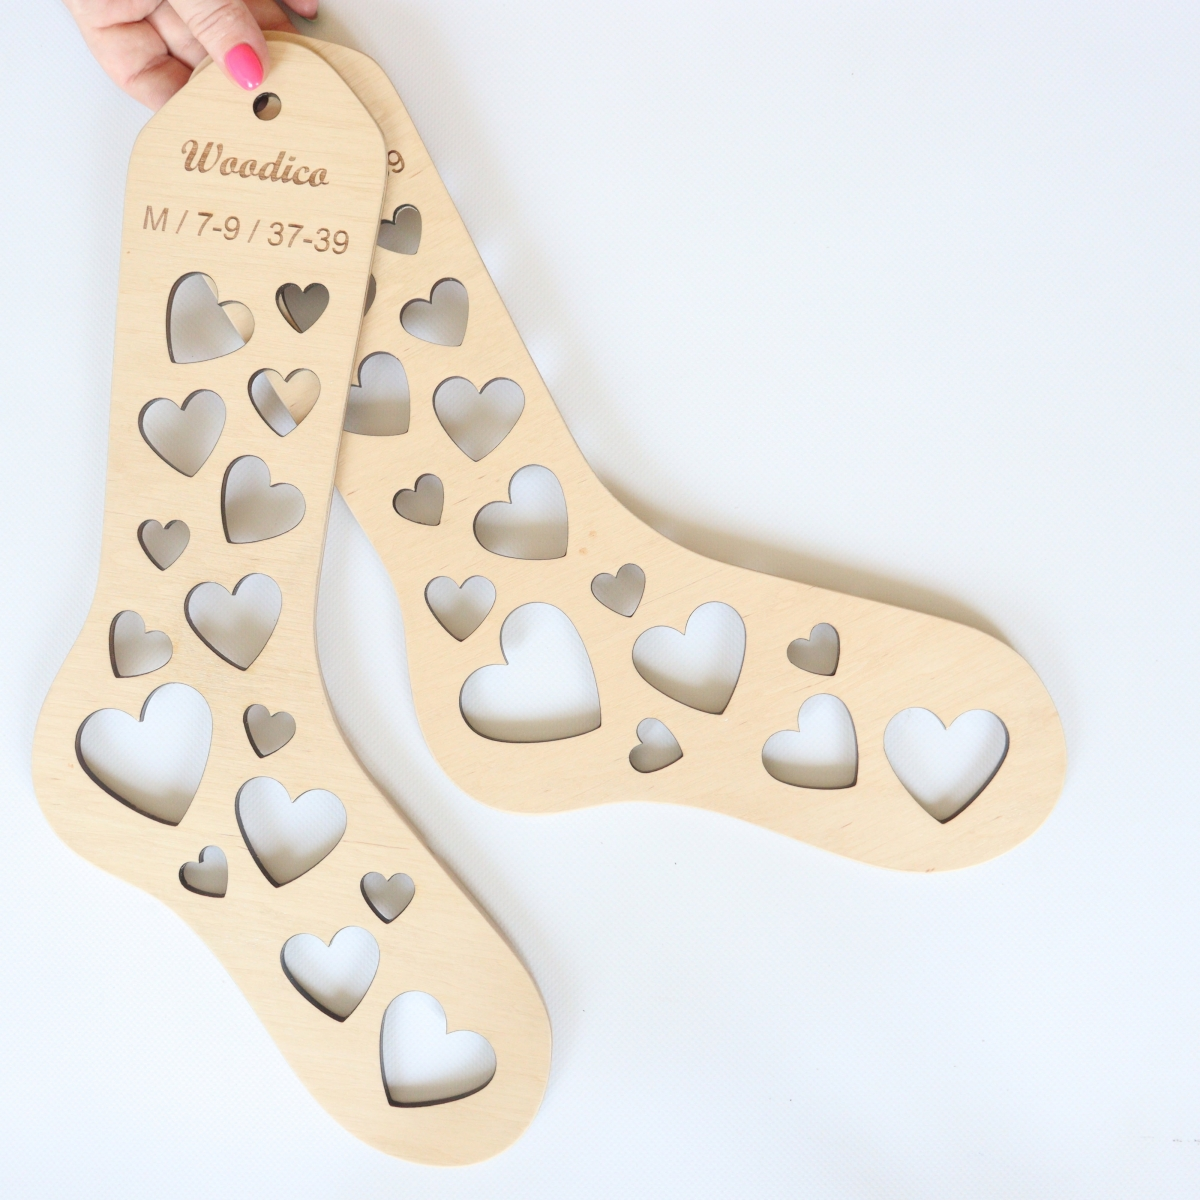 woodico.pro wooden sock blockers hearts 11 1200x1200 - Wooden sock blockers / Hearts